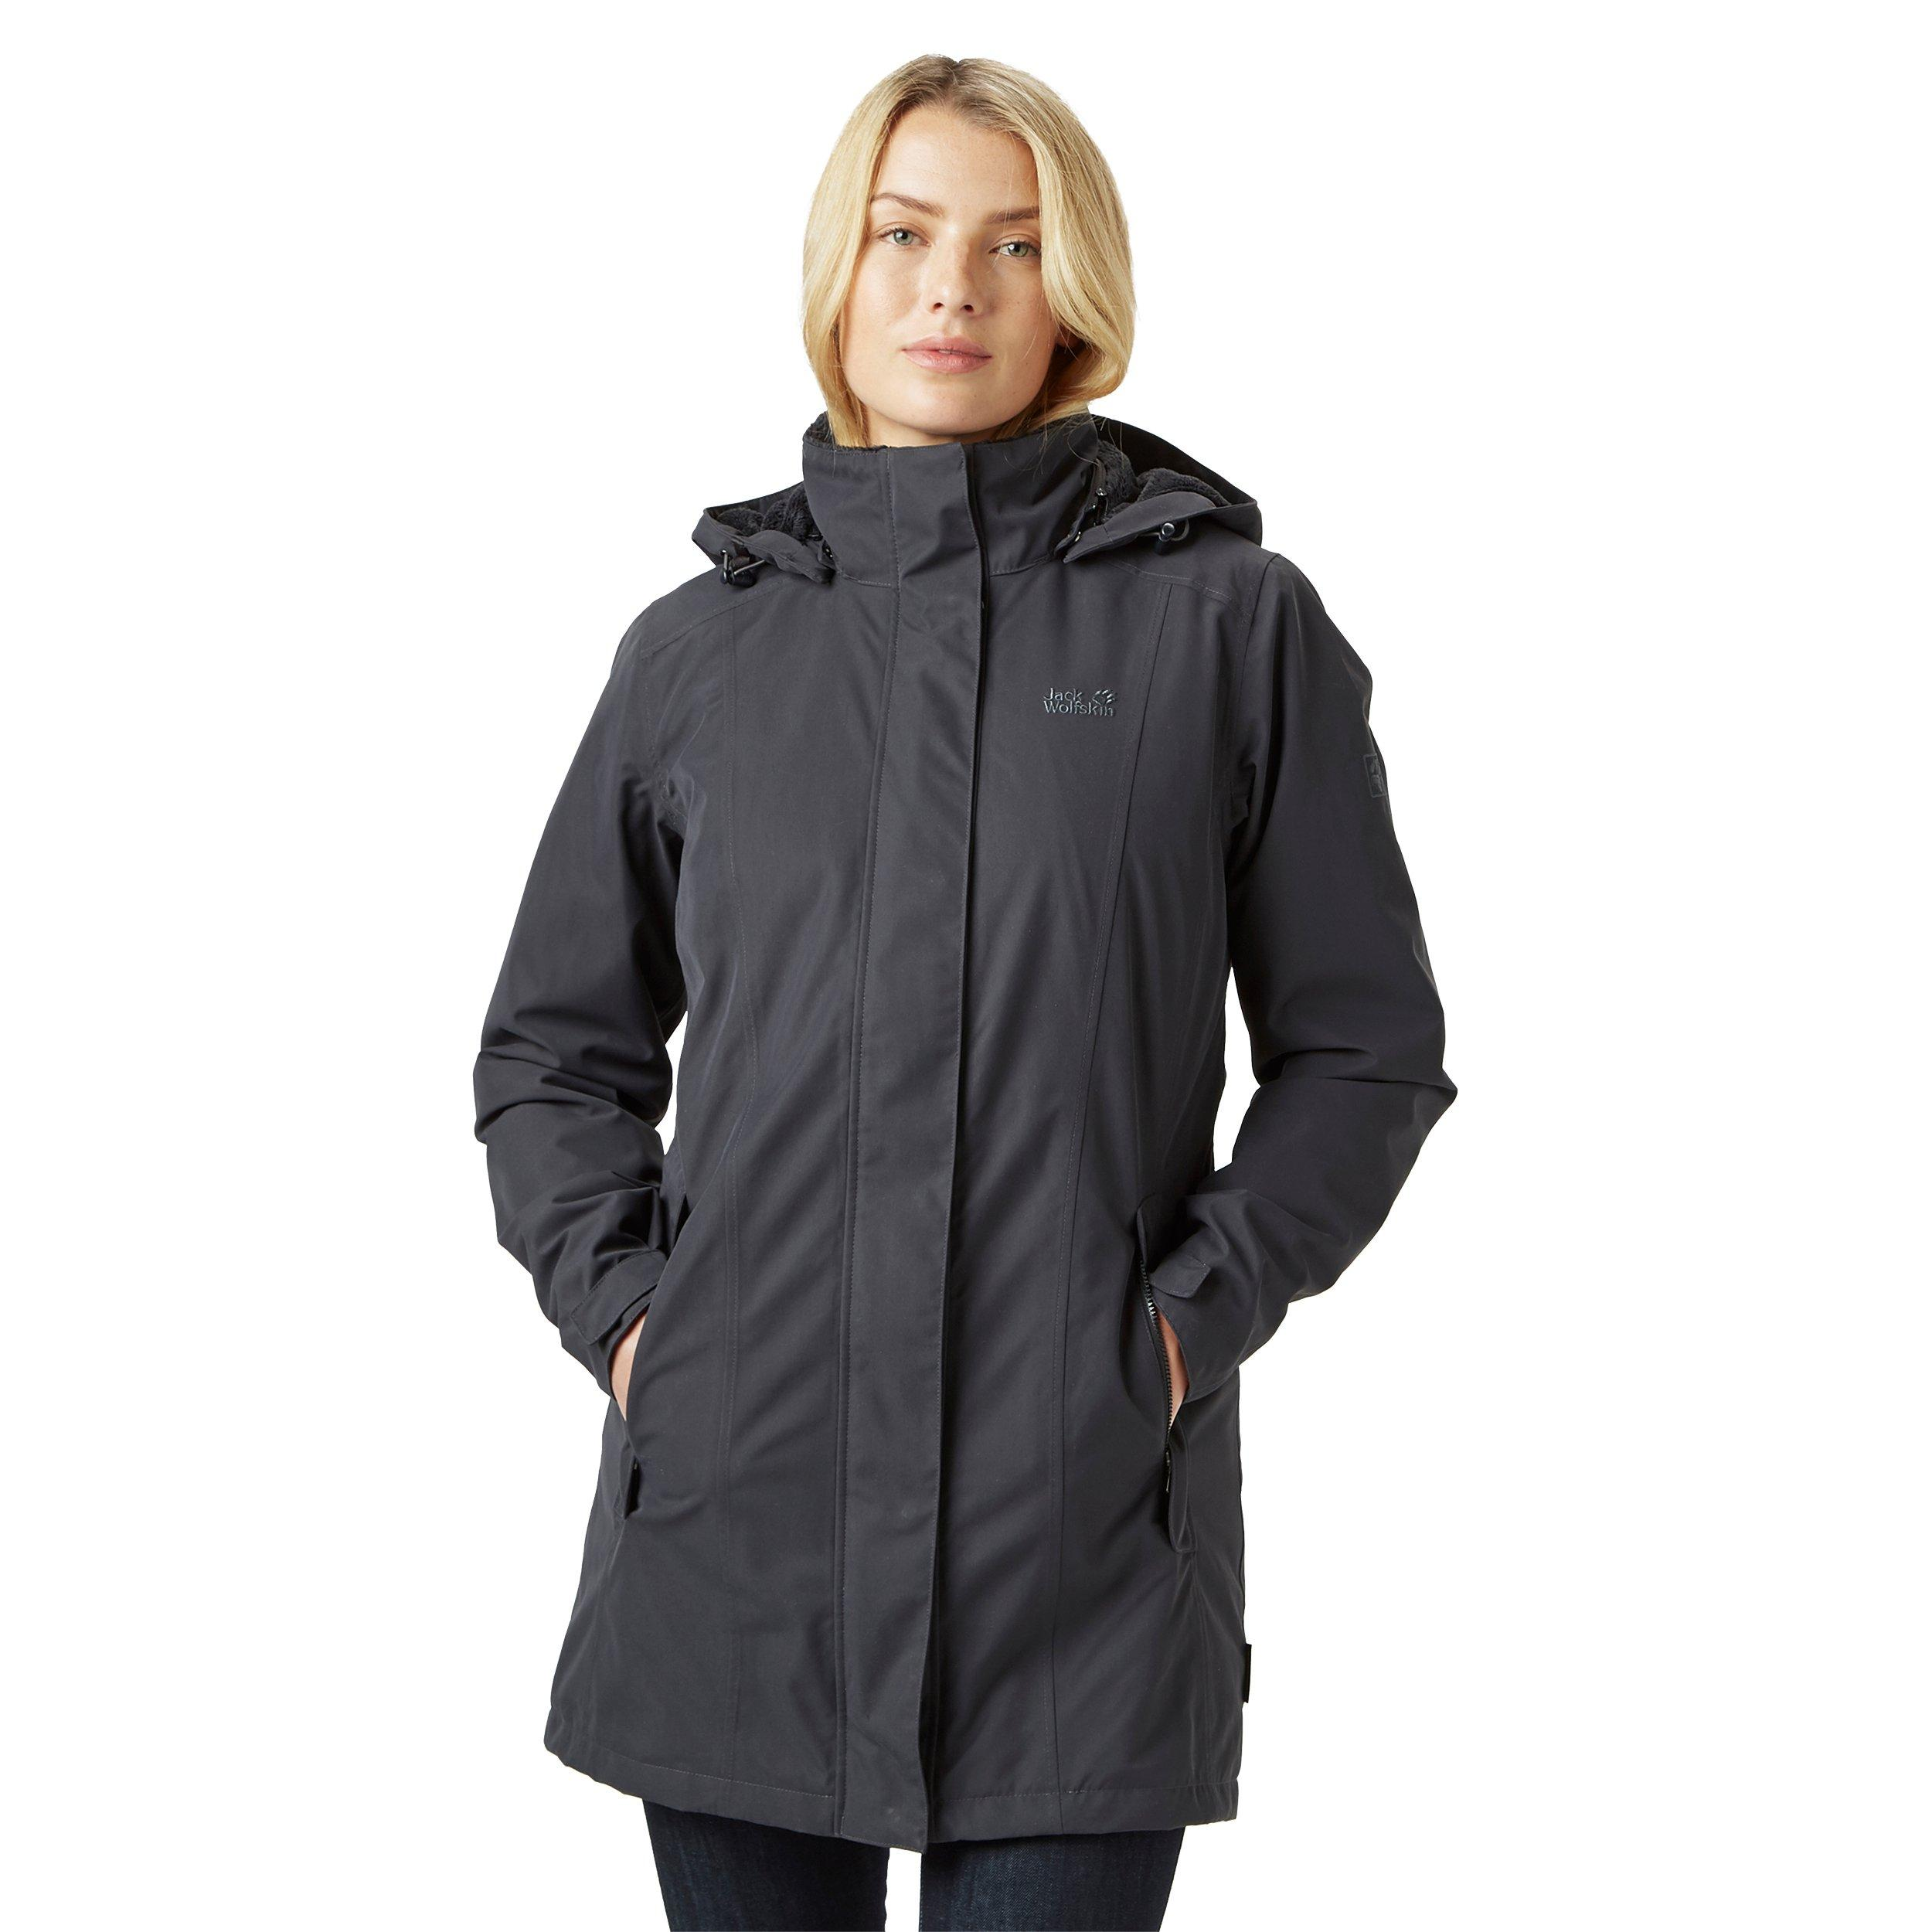 9d692daf995 Women's Madison Avenue Jacket